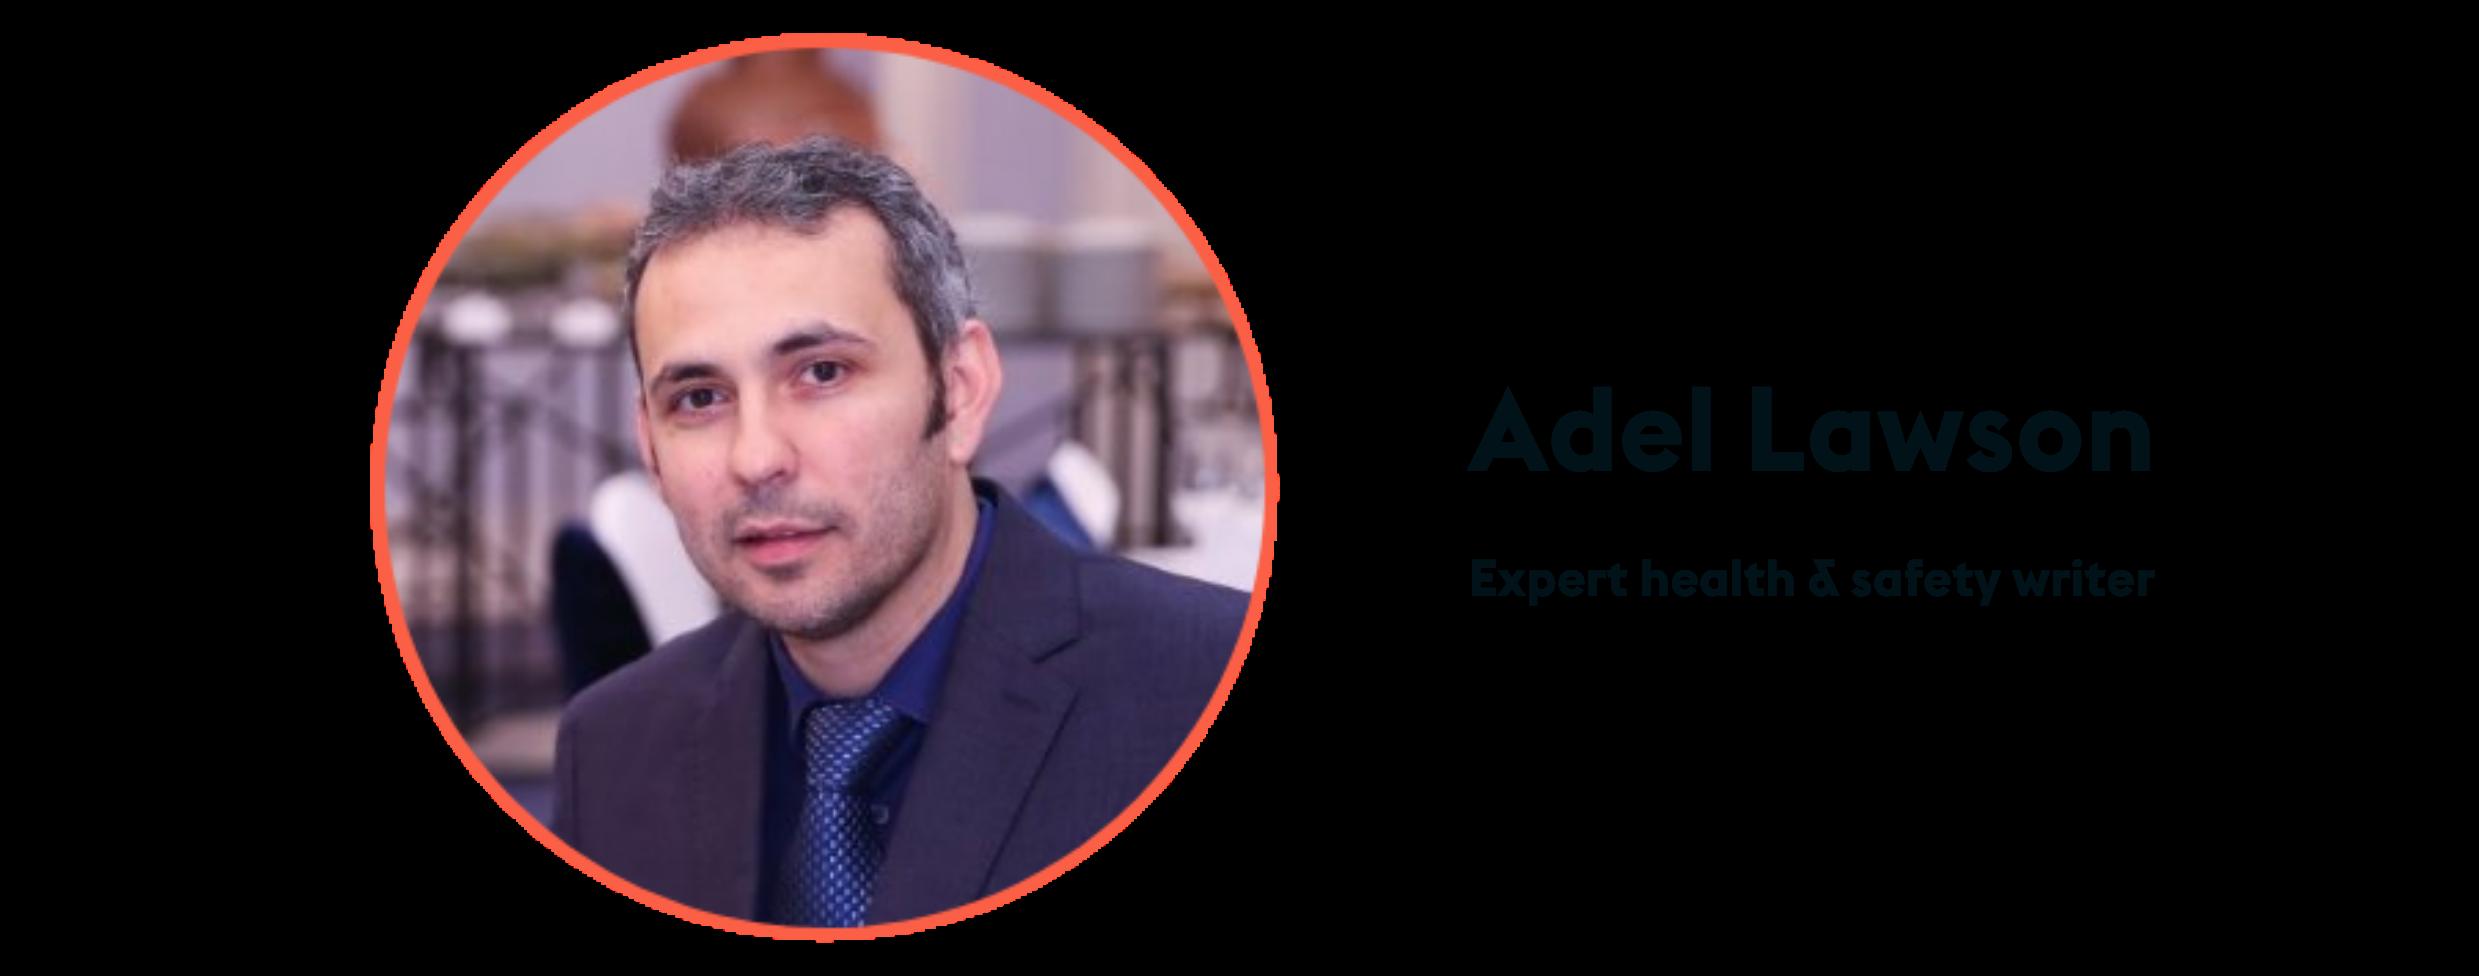 Adel Lawson Info for web